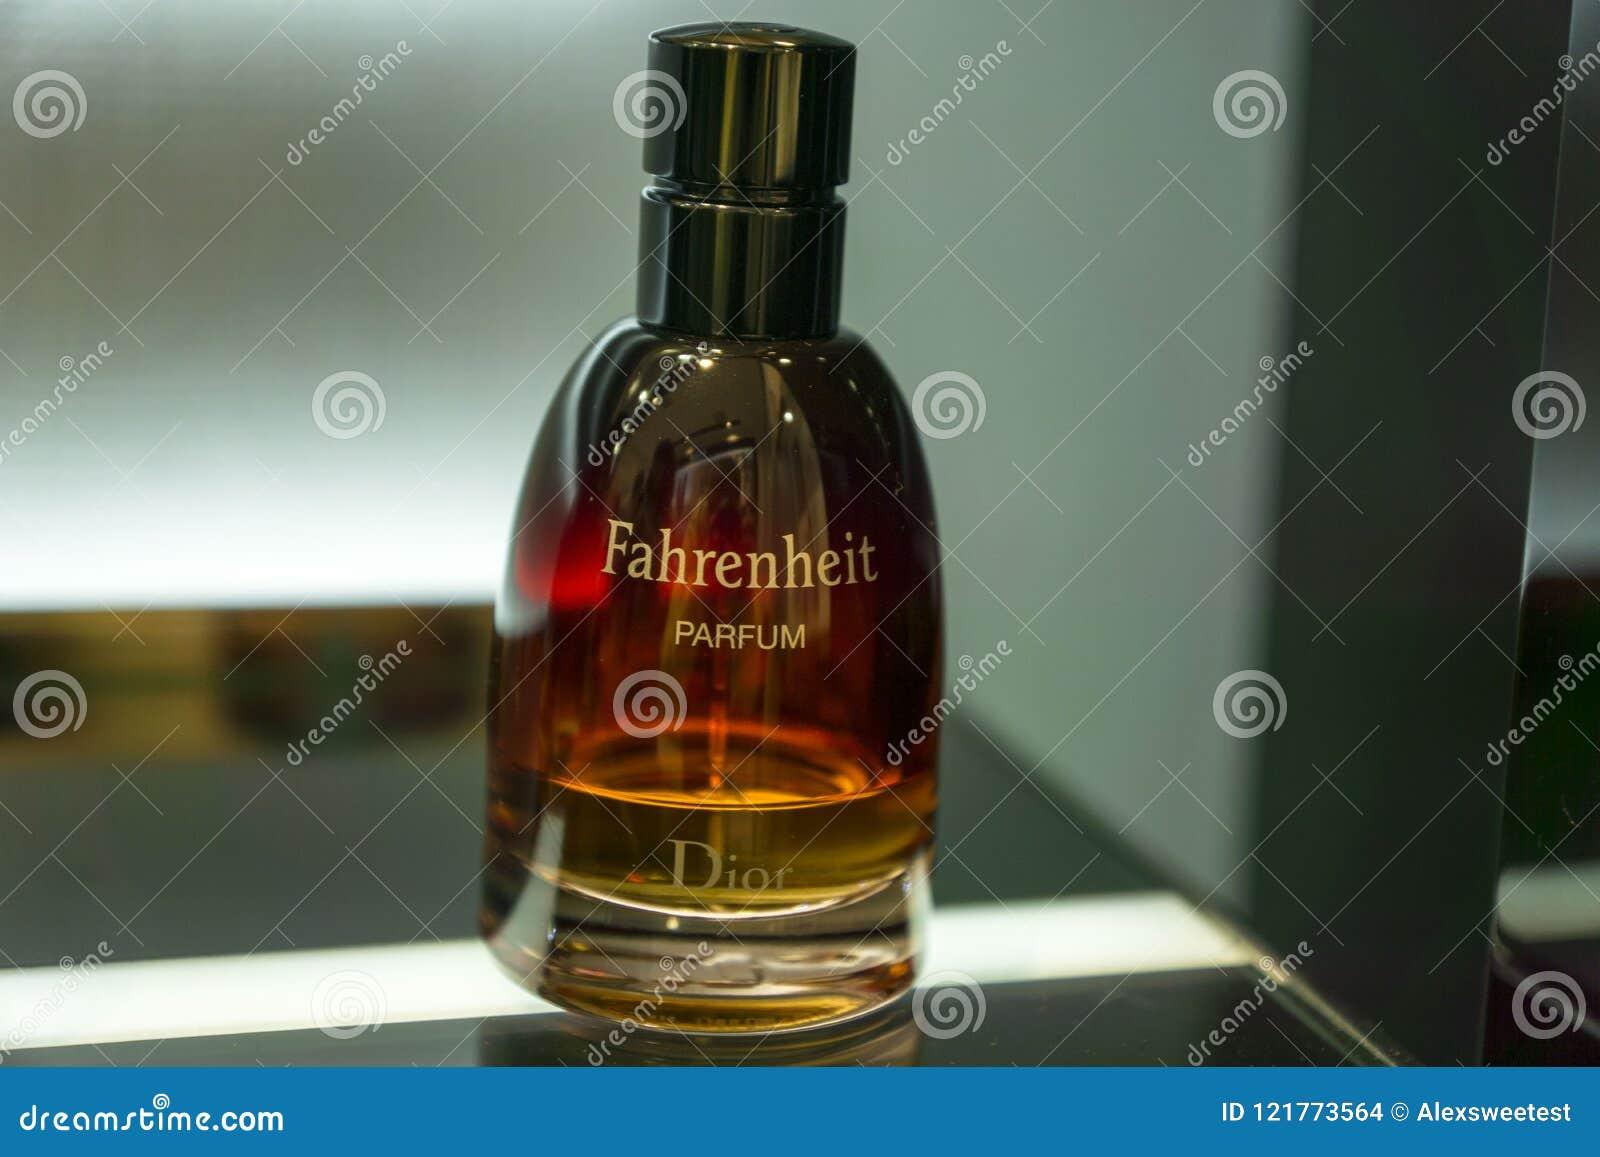 Christian Dior Fahrenheit Perfume Editorial Stock Image